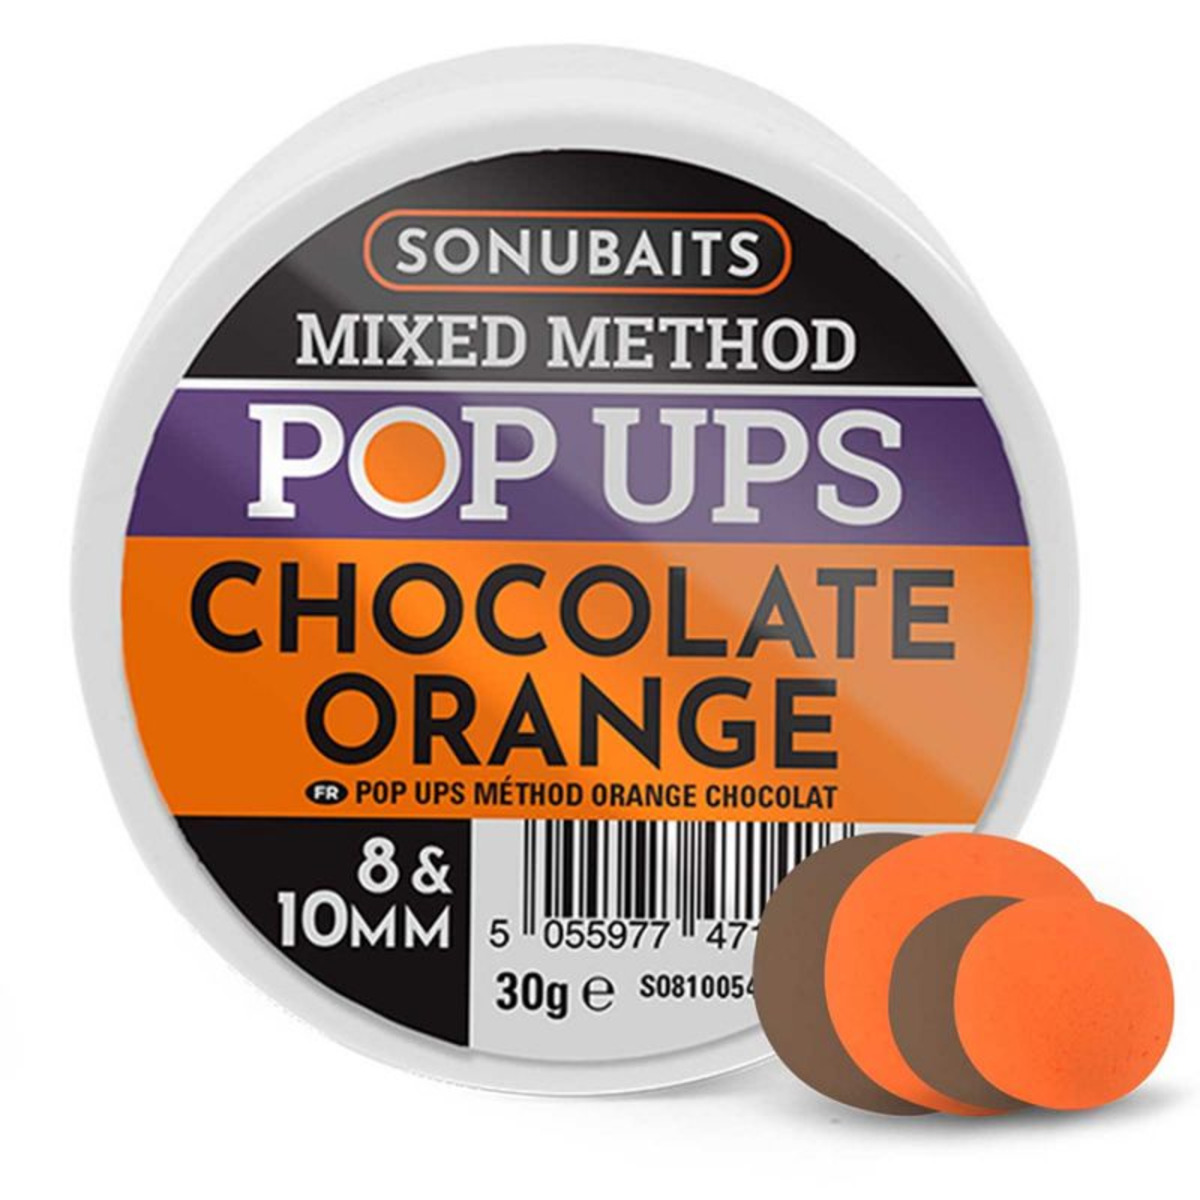 Sonubaits Mixed Method Pop Ups - 8 - 10 mm - Cioccolato - Arancia